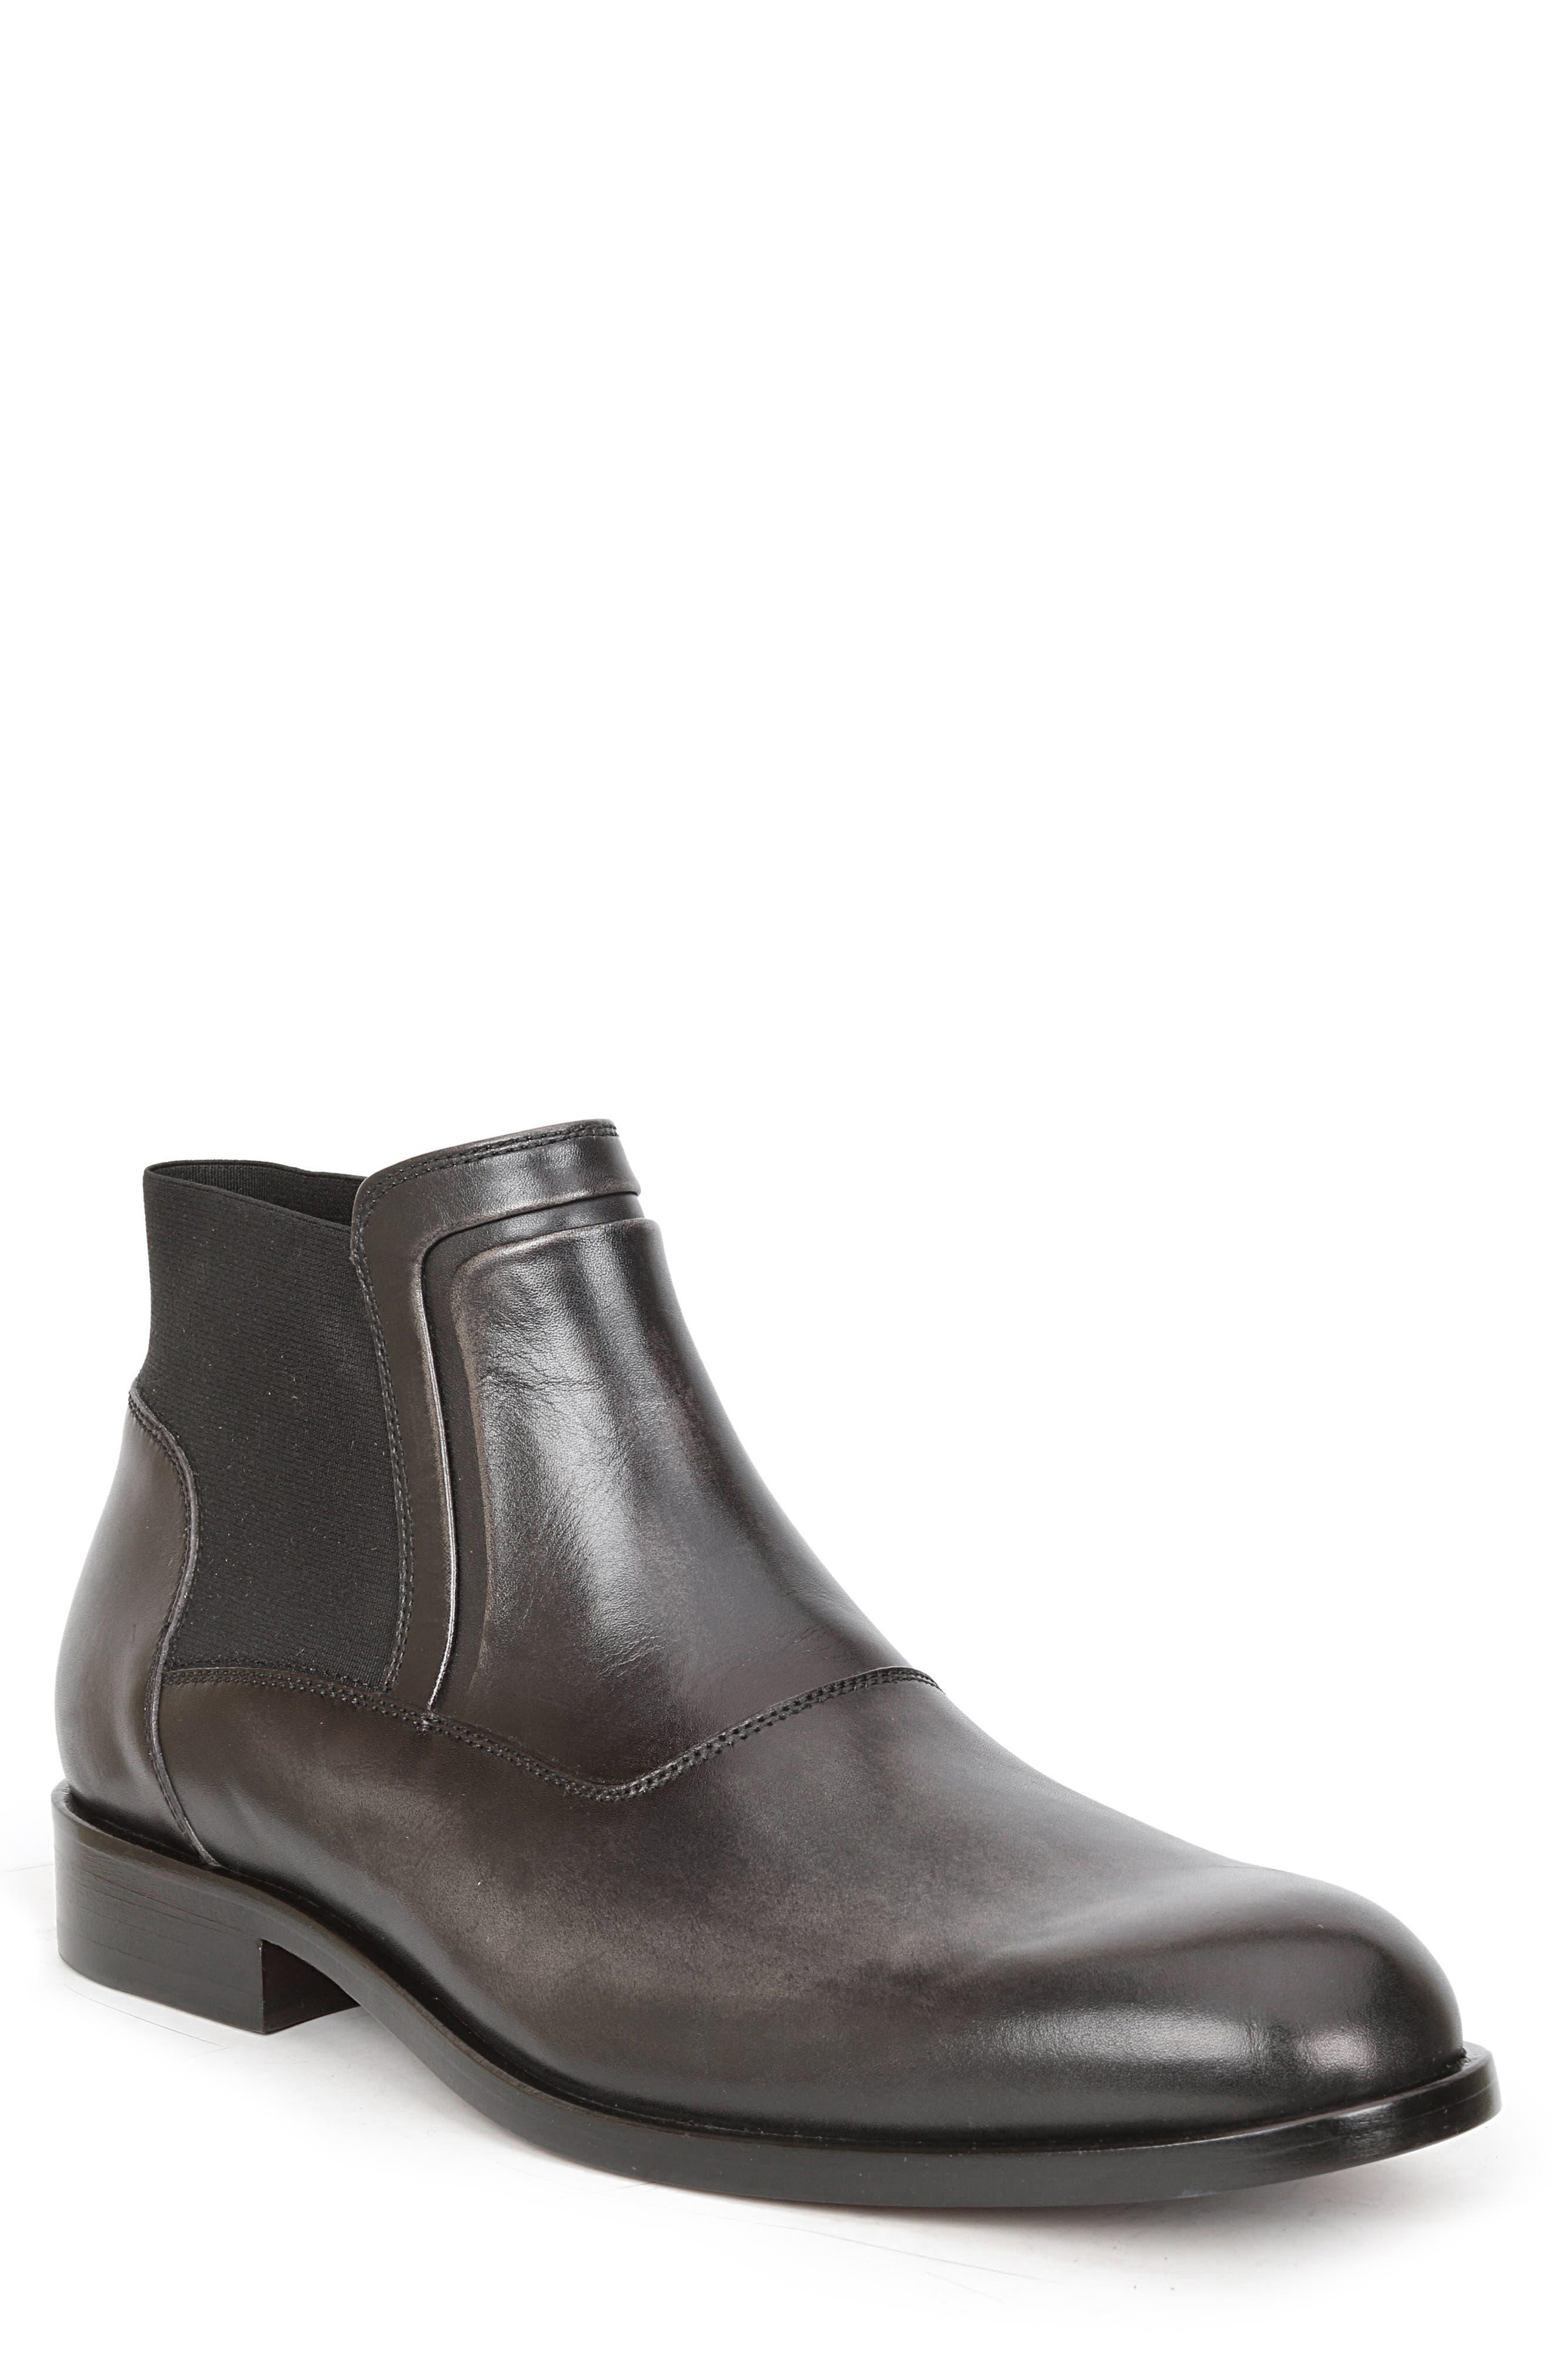 Bruno Magli Sancho Chelsea Boot- Grey